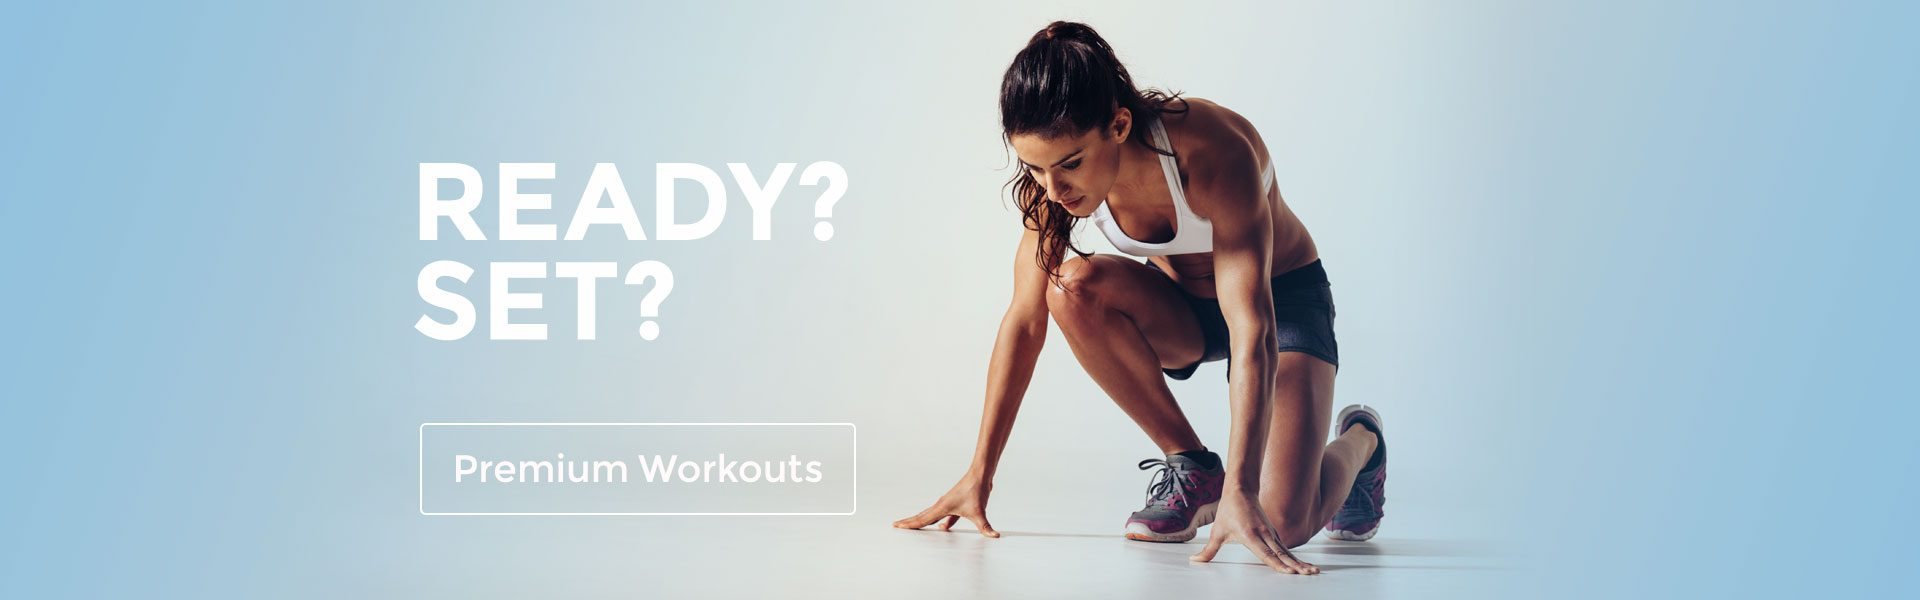 premium online workouts